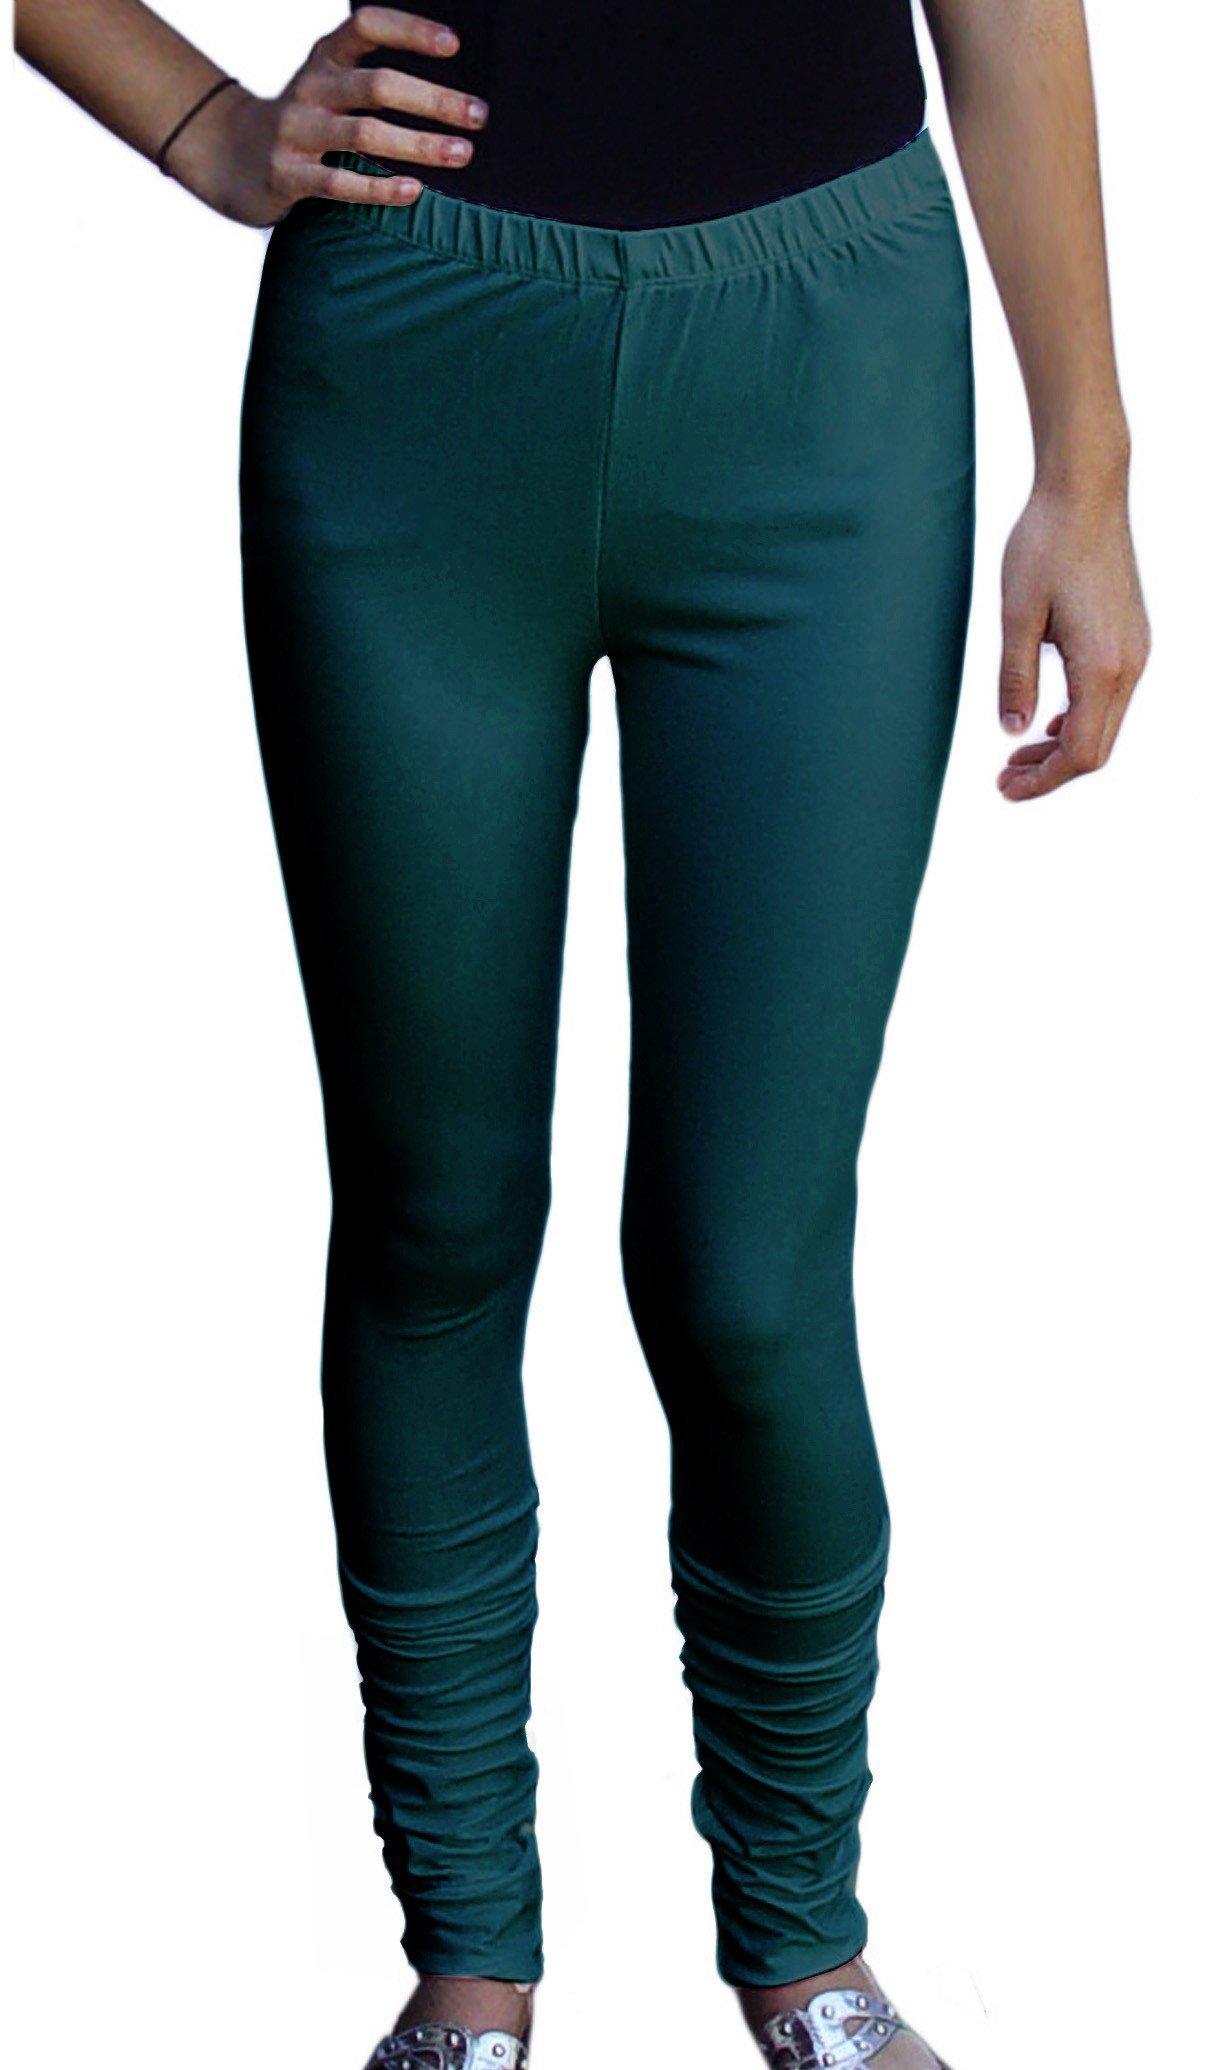 Ayurvastram Women's Cotton Spandex Jersey Extra Long Leggings, Churidar; Teal;Medium